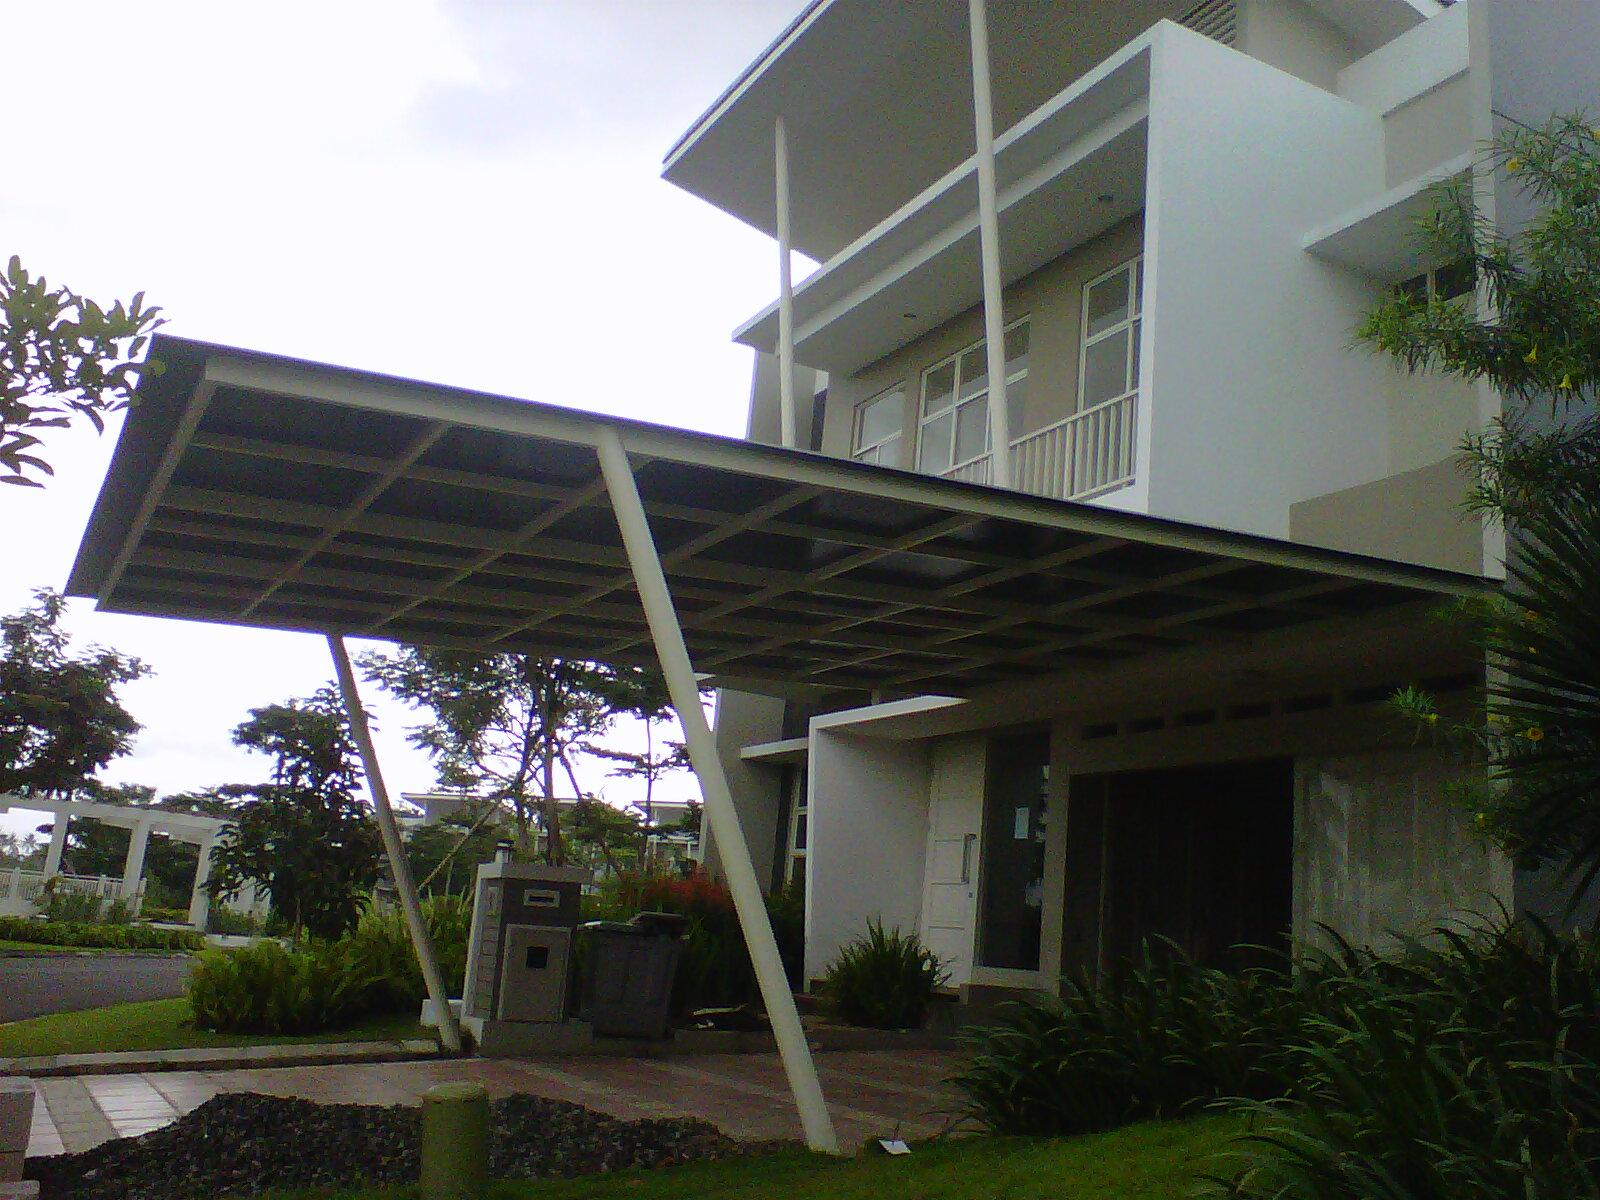 kanopi baja ringan tiang miring gambar expo desain rumah